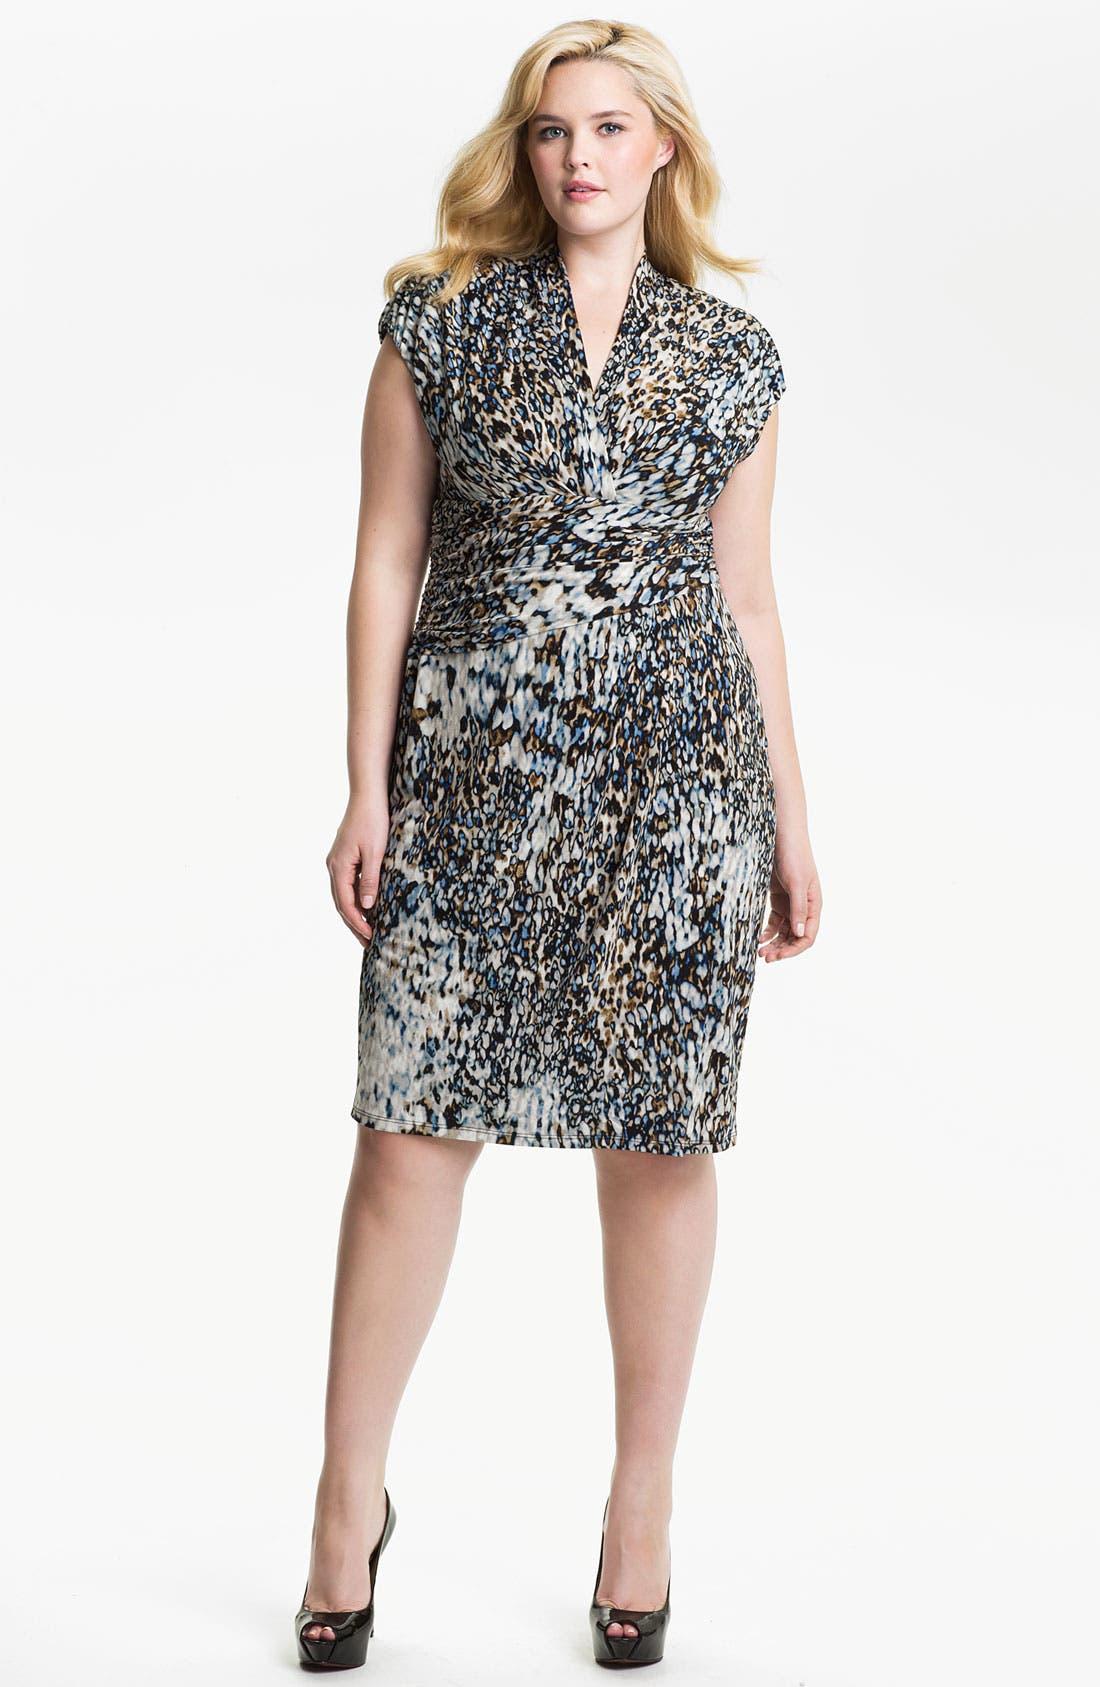 Main Image - Suzi Chin for Maggy Boutique Print Surplice Sheath Dress (Plus)